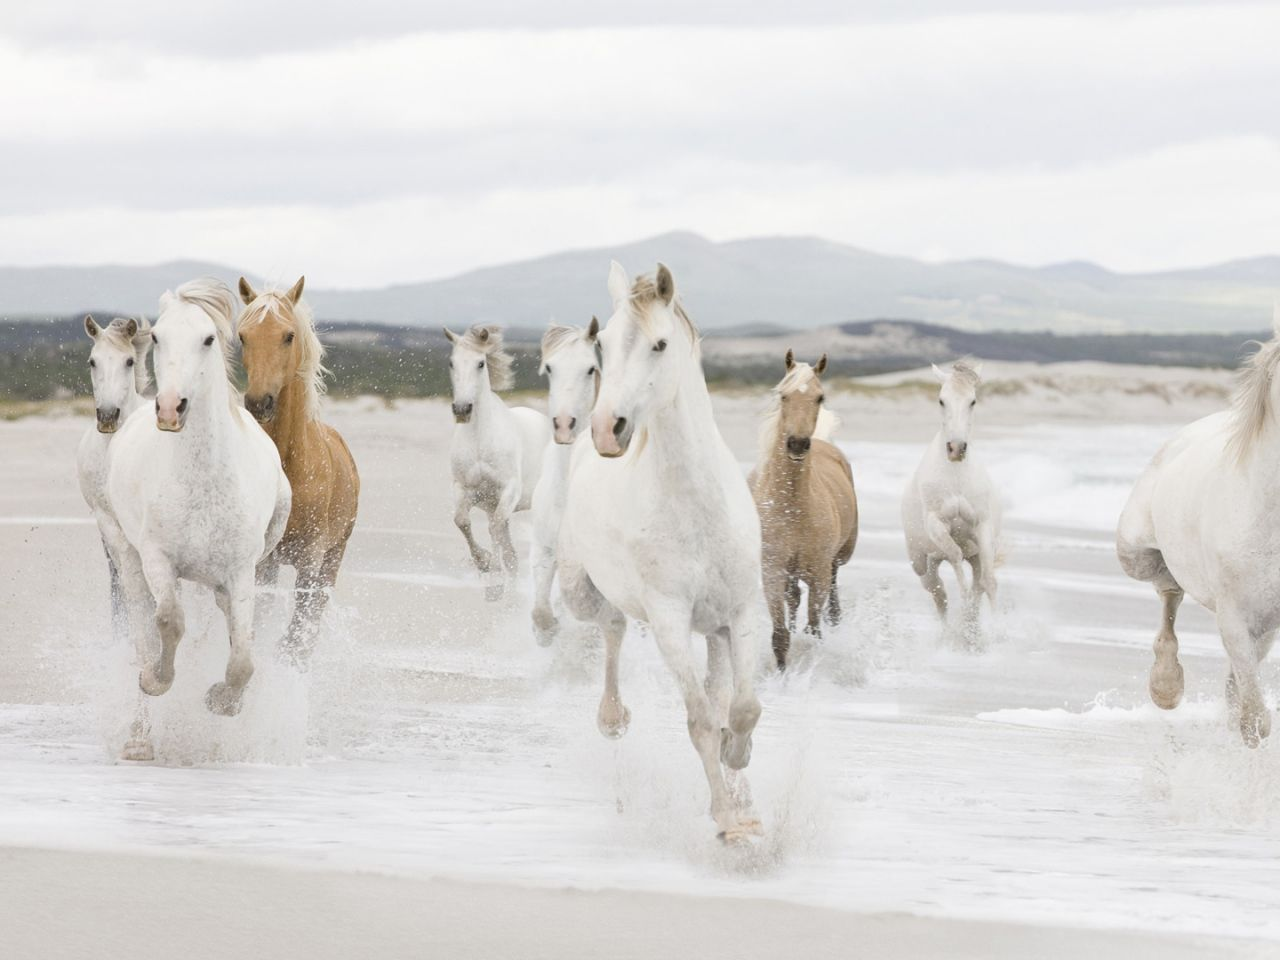 lauma kuvia, hevonen taustakuvia, ranta vektori, vesi taustat, paeta materiaali